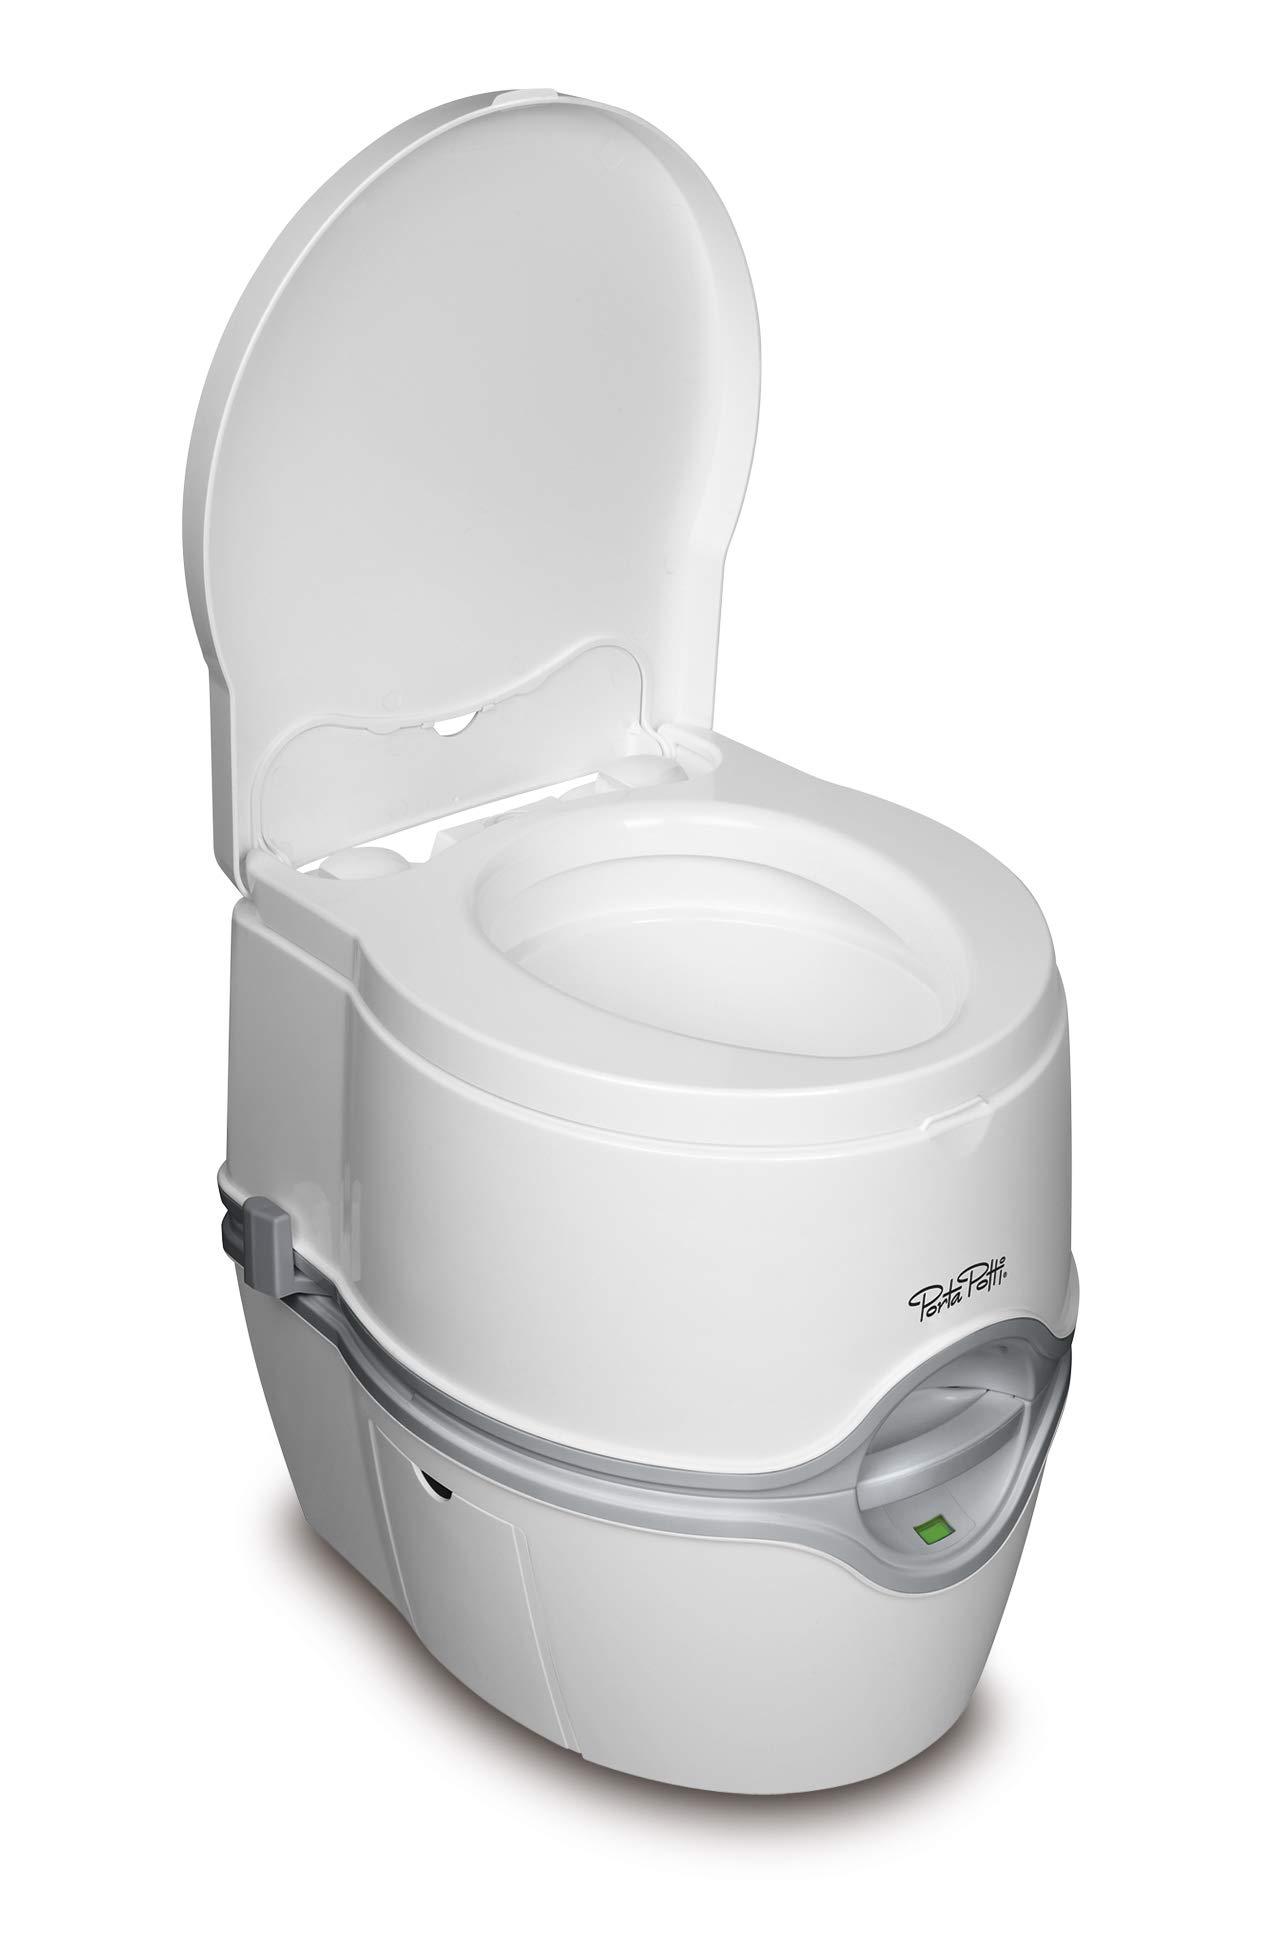 Thetford 92305 Porta Potti 565P Excellence Portable Toilet (Manual), 448 x 388 x 450 mm 1